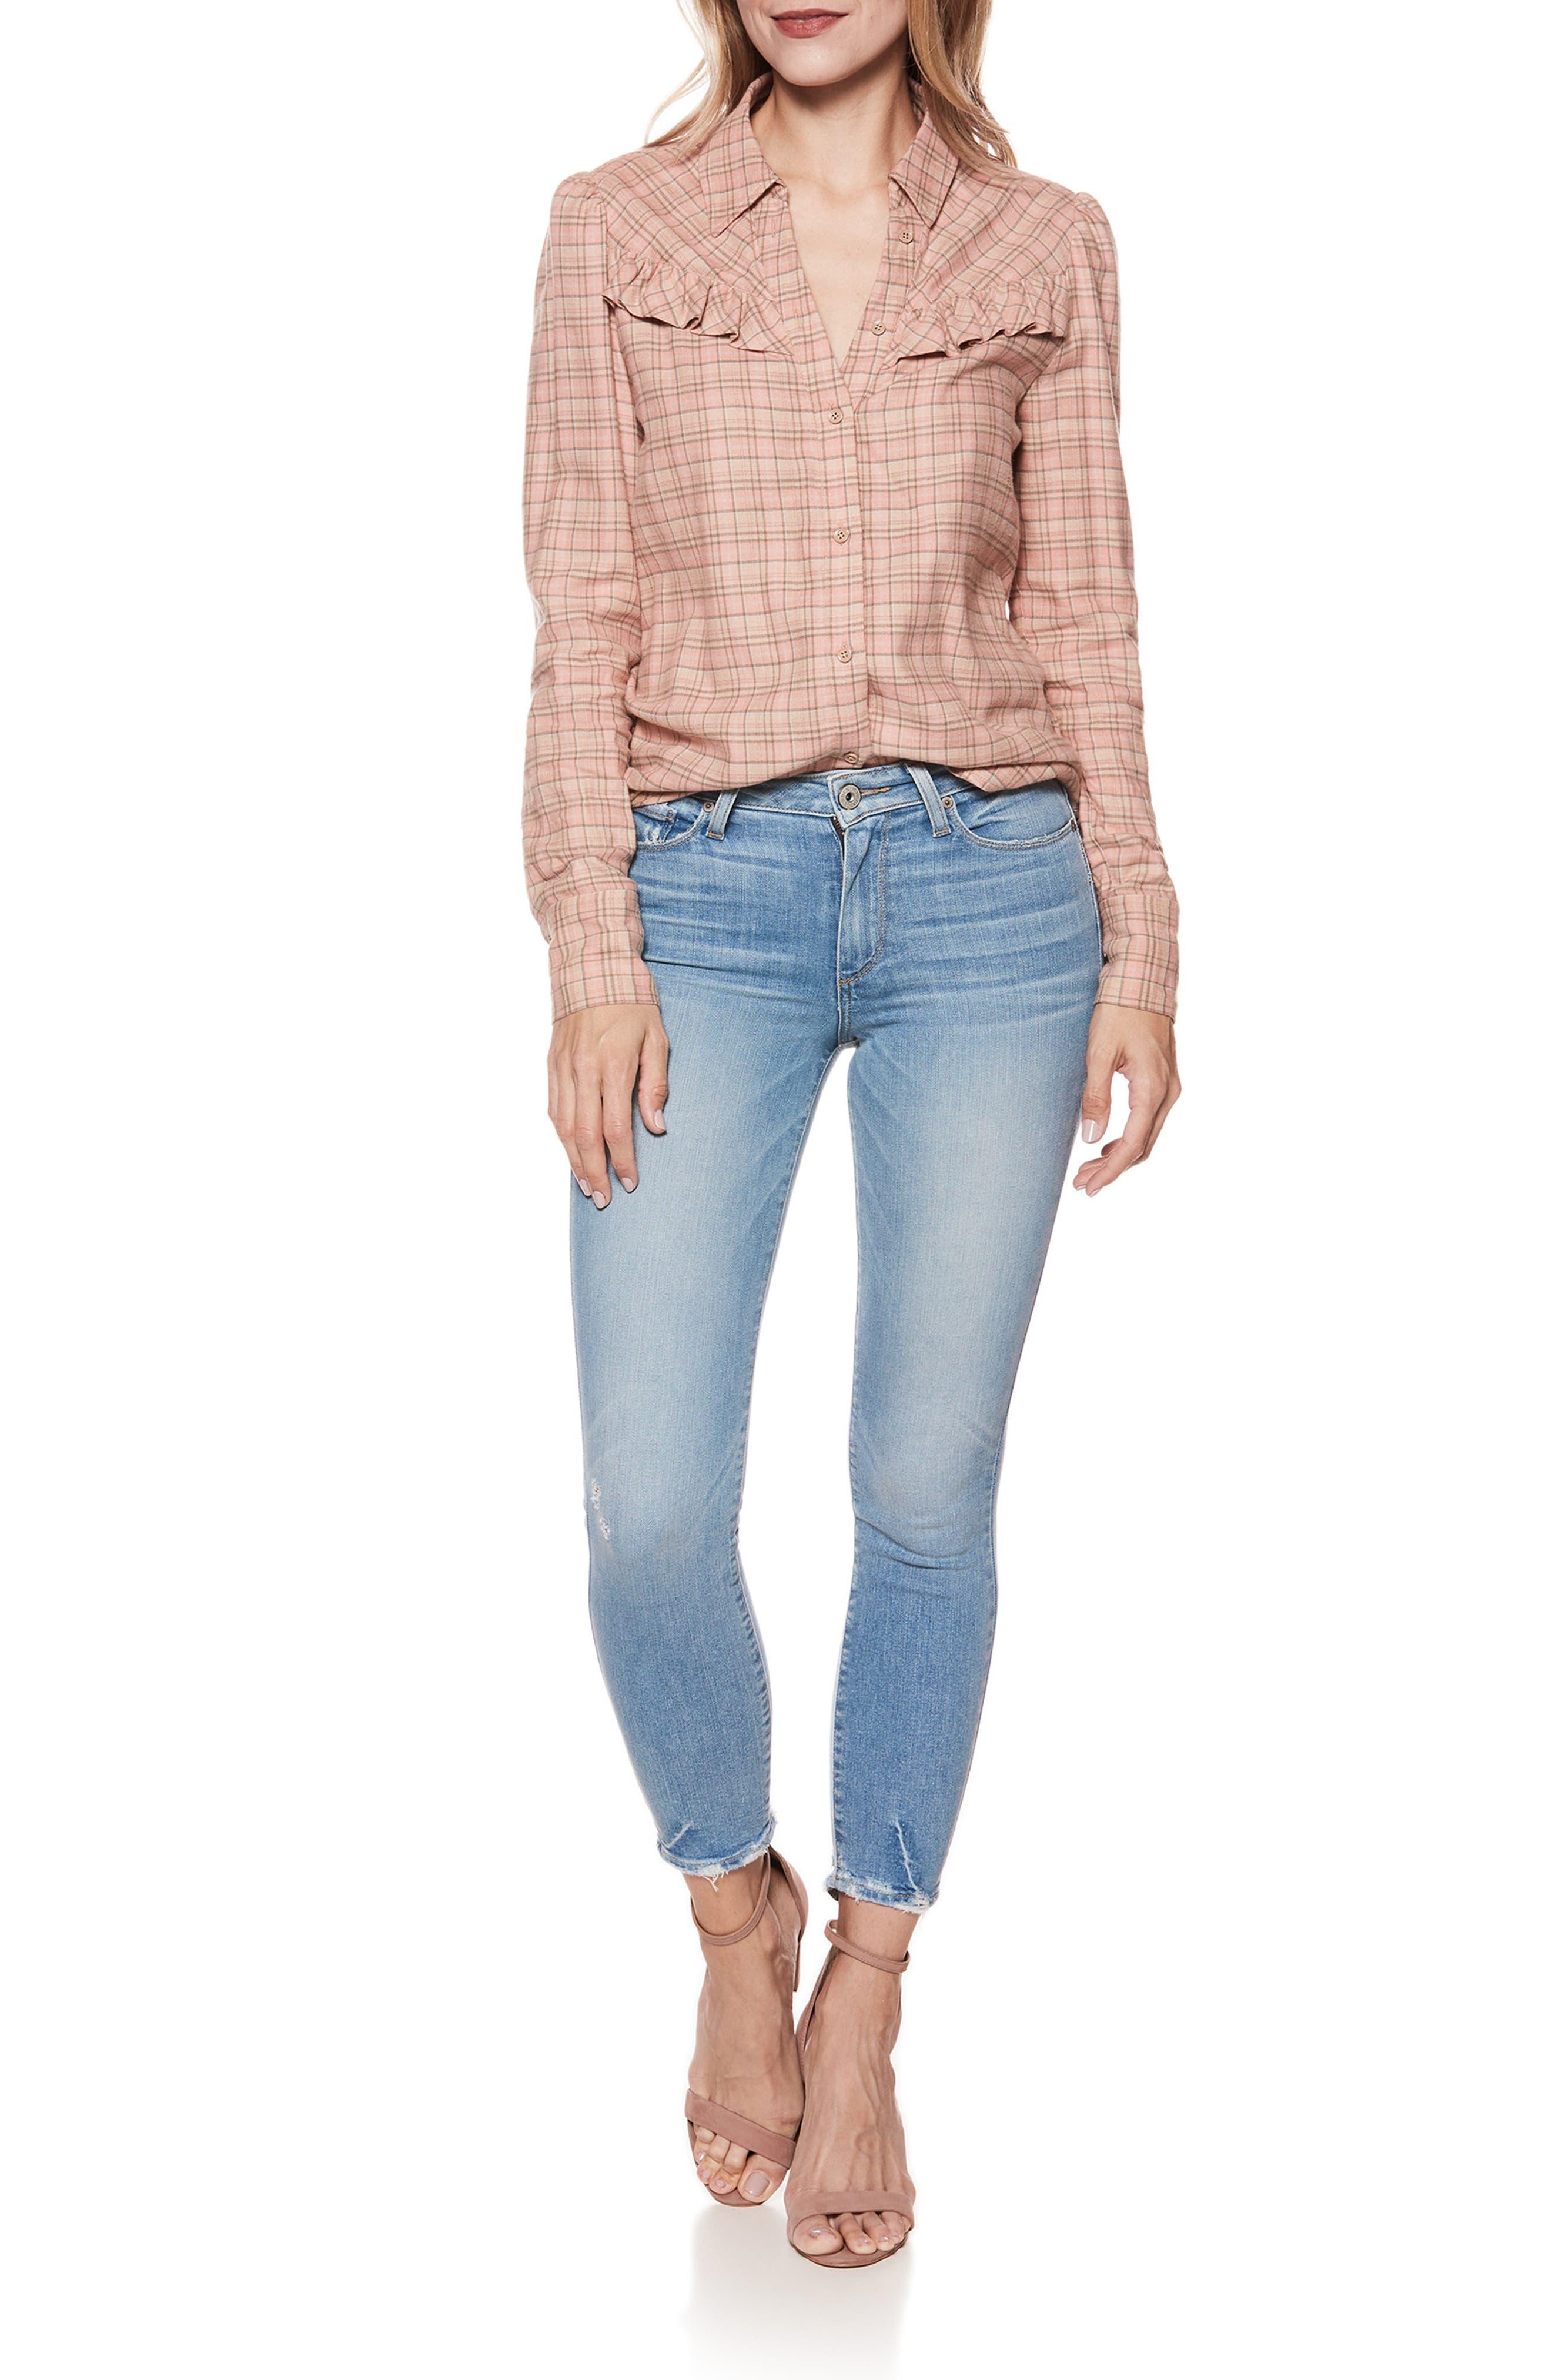 PAIGE, Hoxton Transcend Vintage High Waist Crop Skinny Jeans, Alternate thumbnail 8, color, ATTERBURY W/ TORN BACK HEM